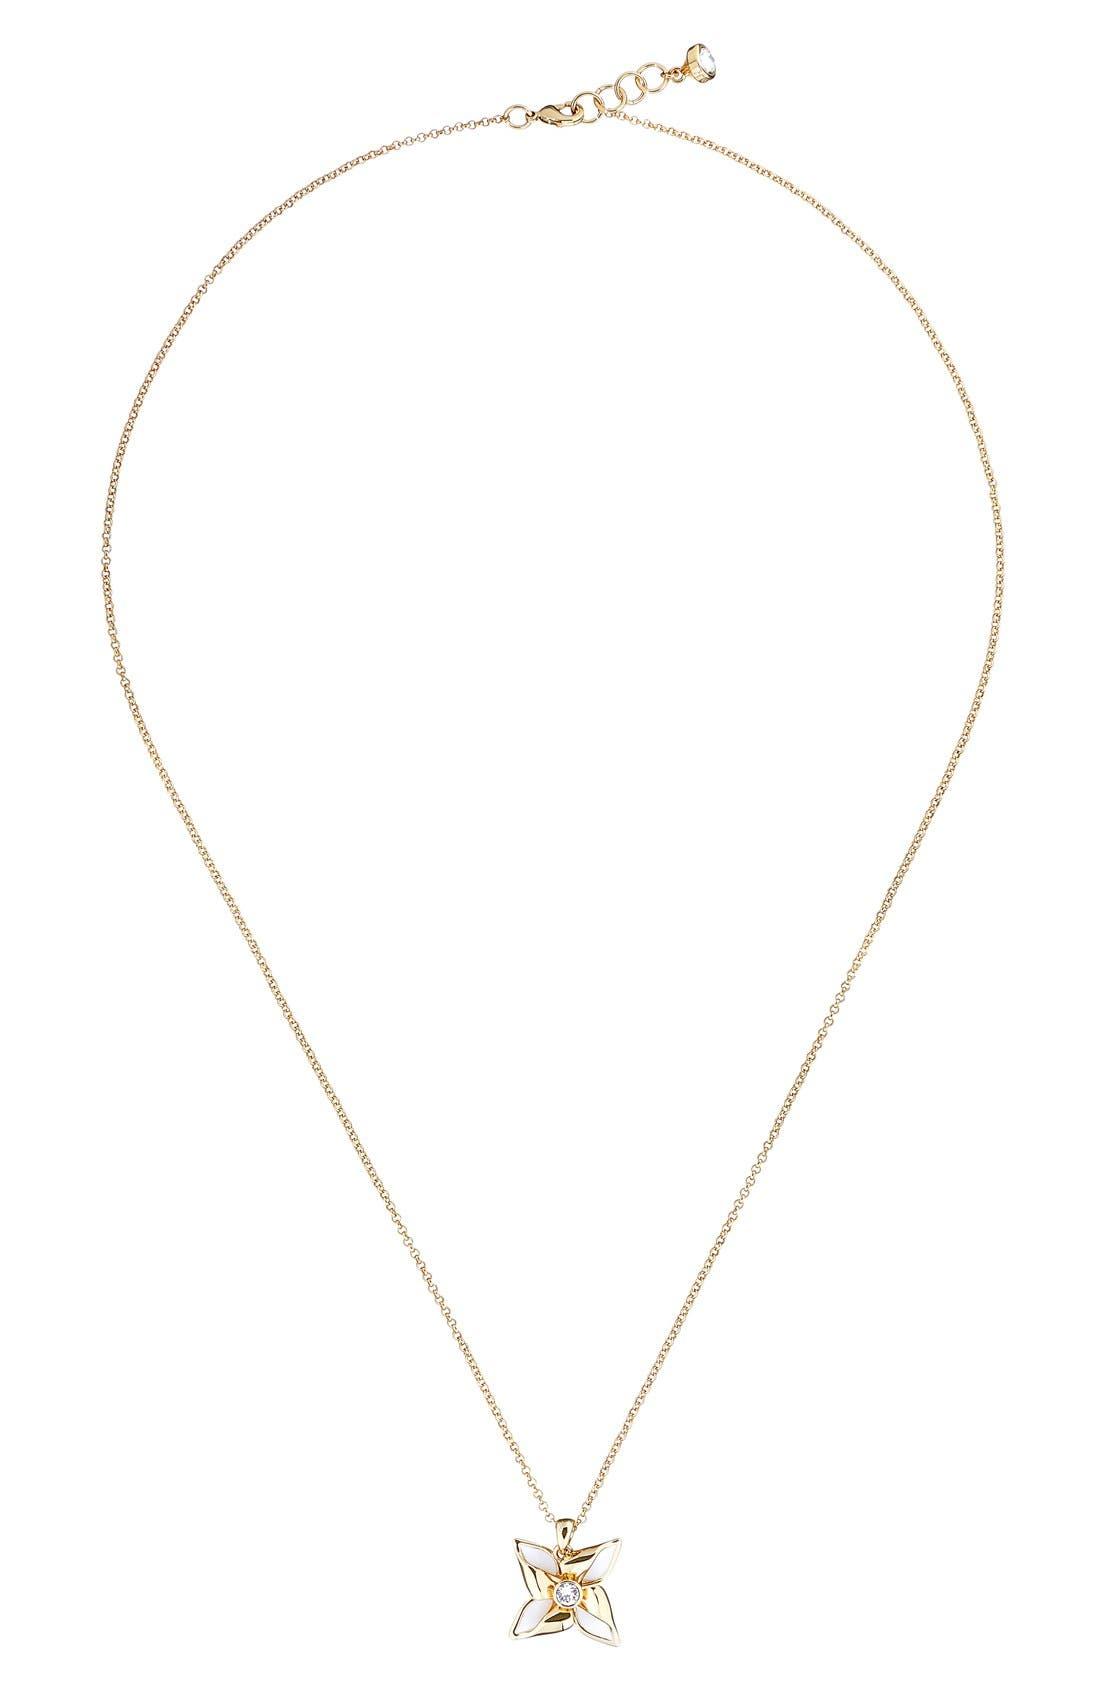 Kineta Pendant Necklace,                             Main thumbnail 1, color,                             Gold/ White